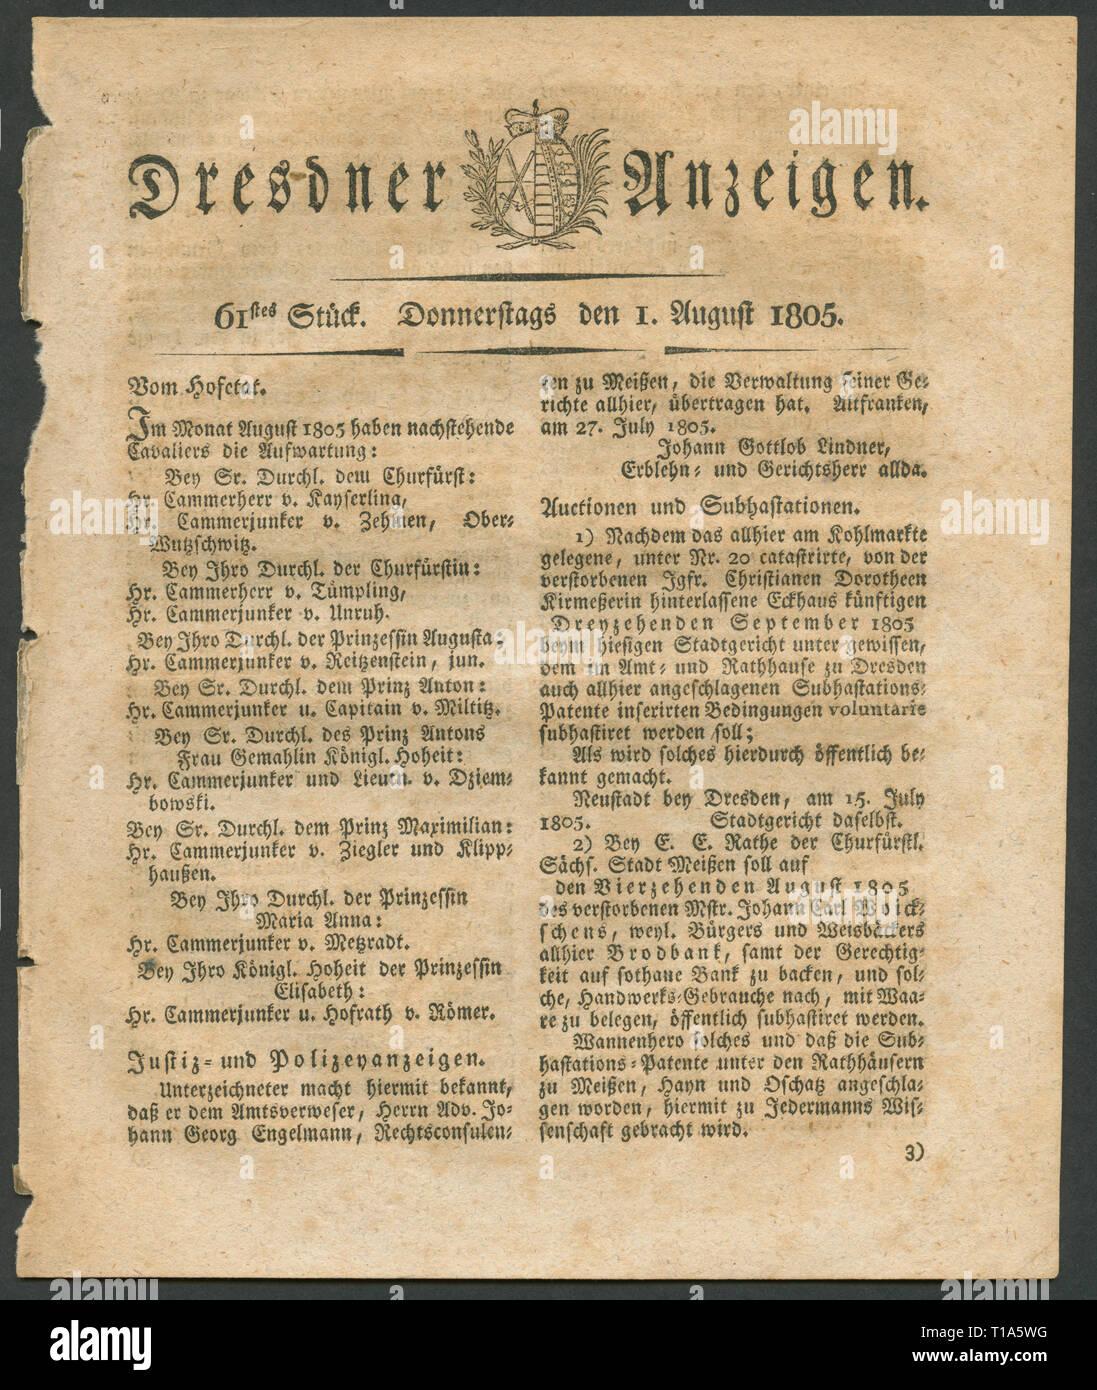 "Deutschland, Sachsen, Dresden, historische Zeitung ""Dresdner Anzeigen"", erschienen am 1.8.1805., Additional-Rights - Clearance-Info - Not-Available Stockbild"